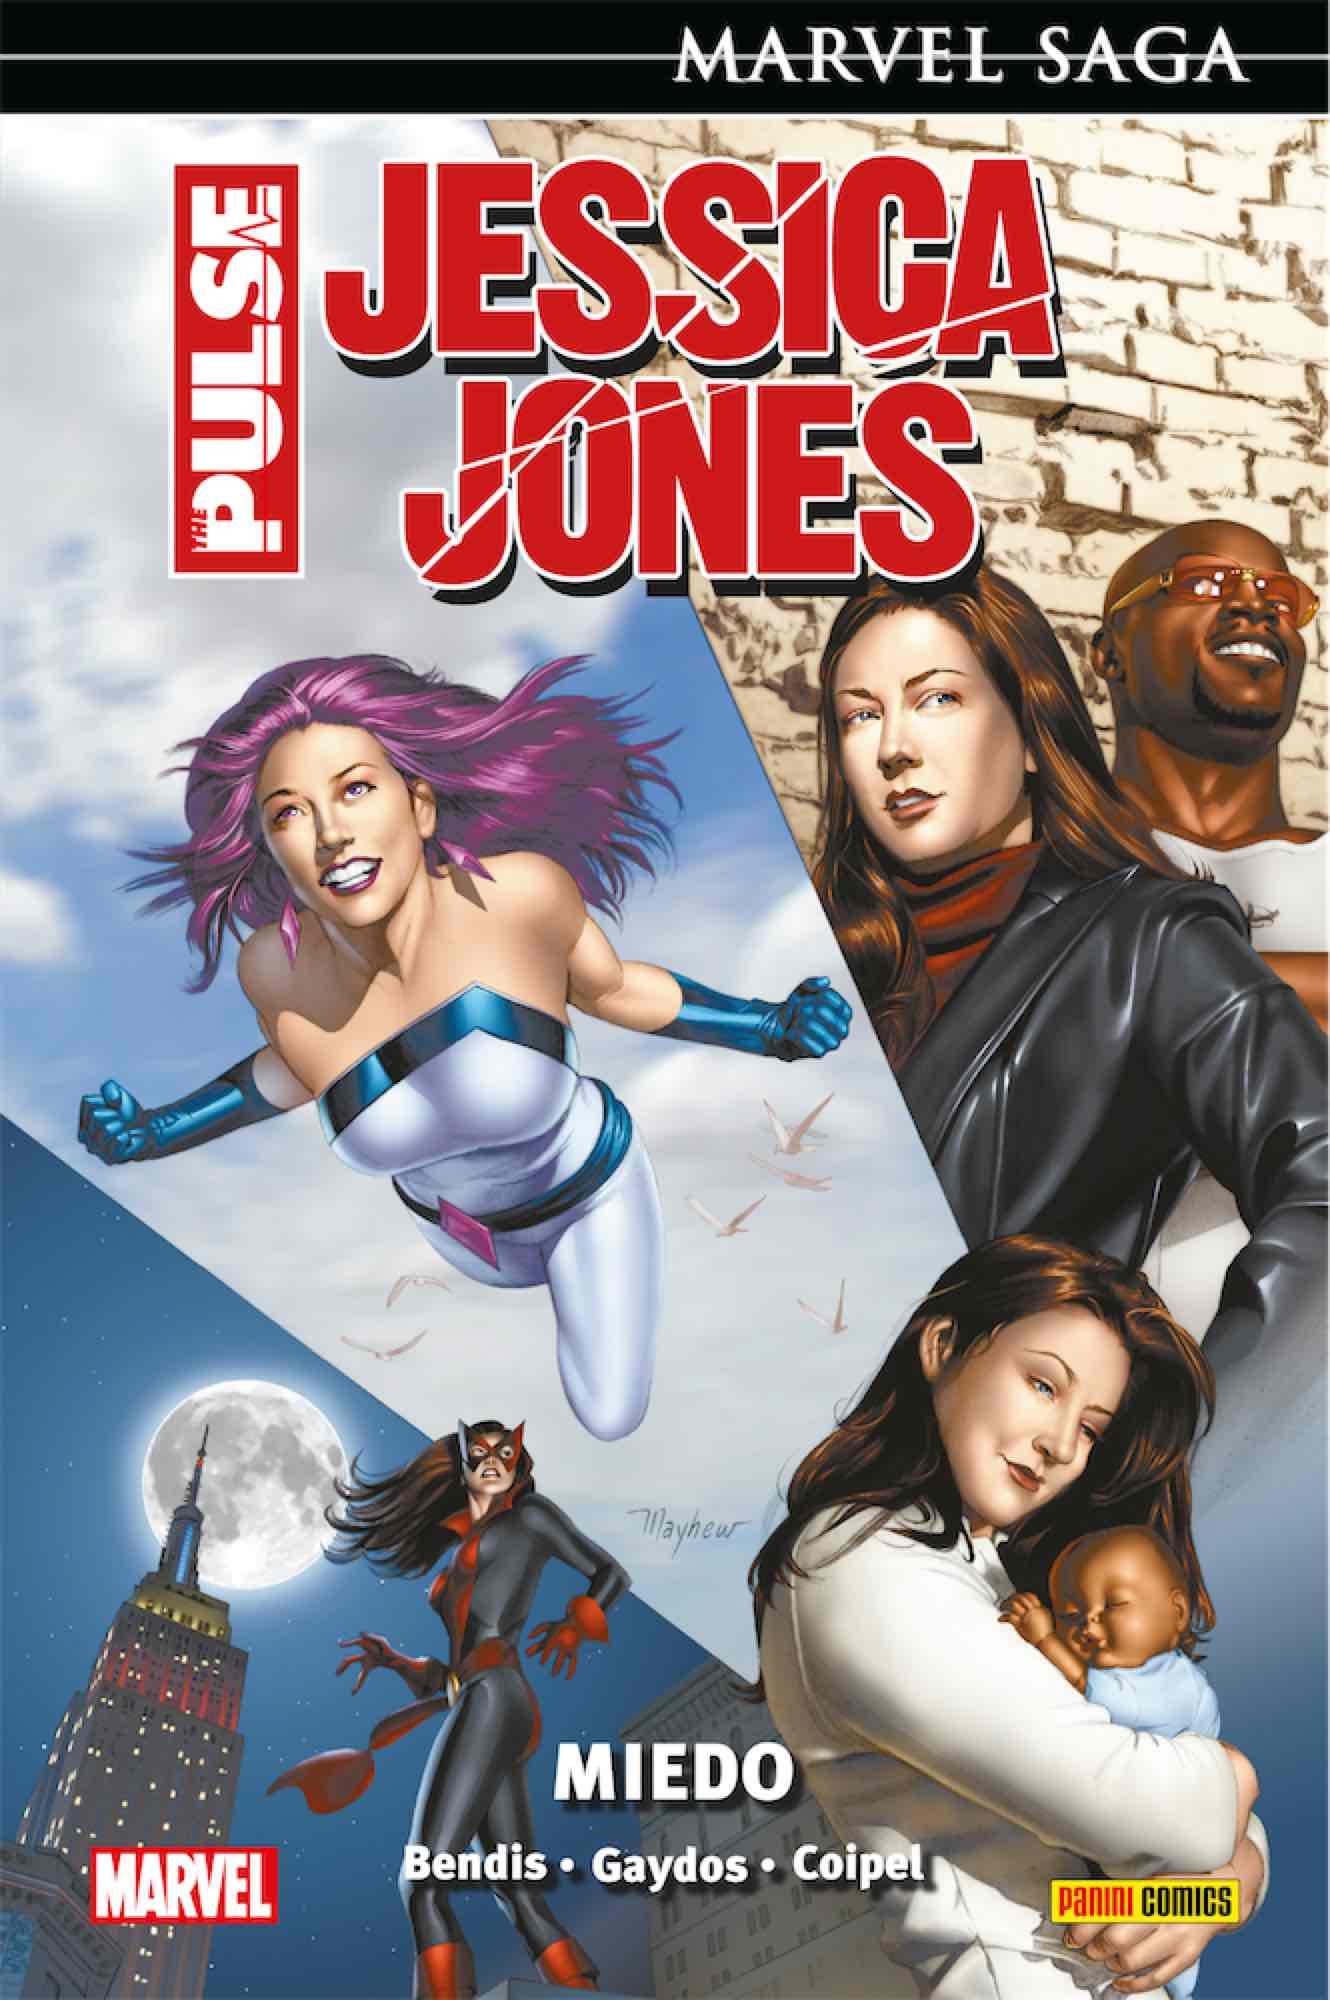 JESSICA JONES: THE PULSE 03. MIEDO (MARVEL SAGA 116)